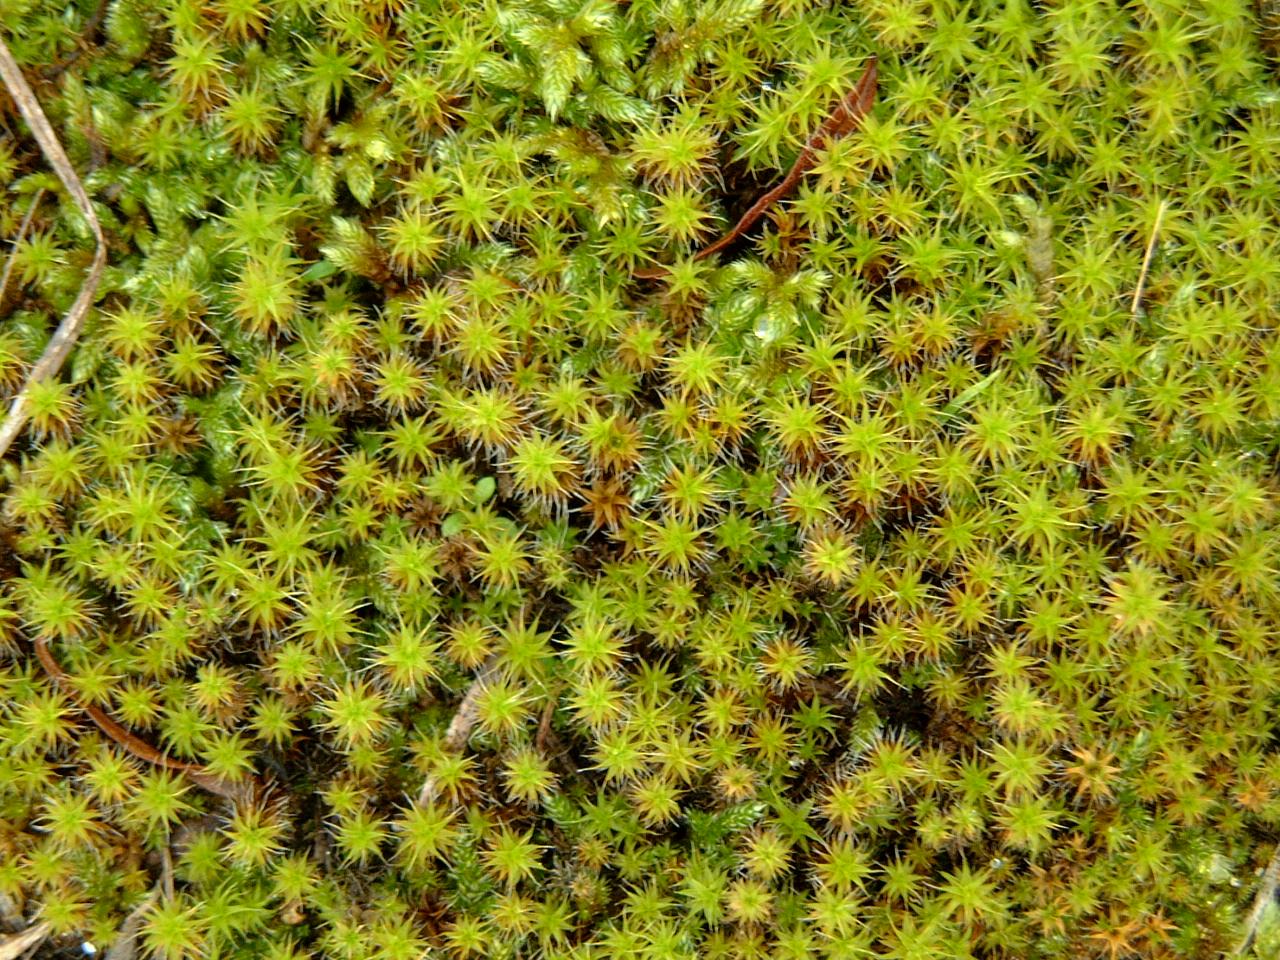 maartent plants green field dense thistles